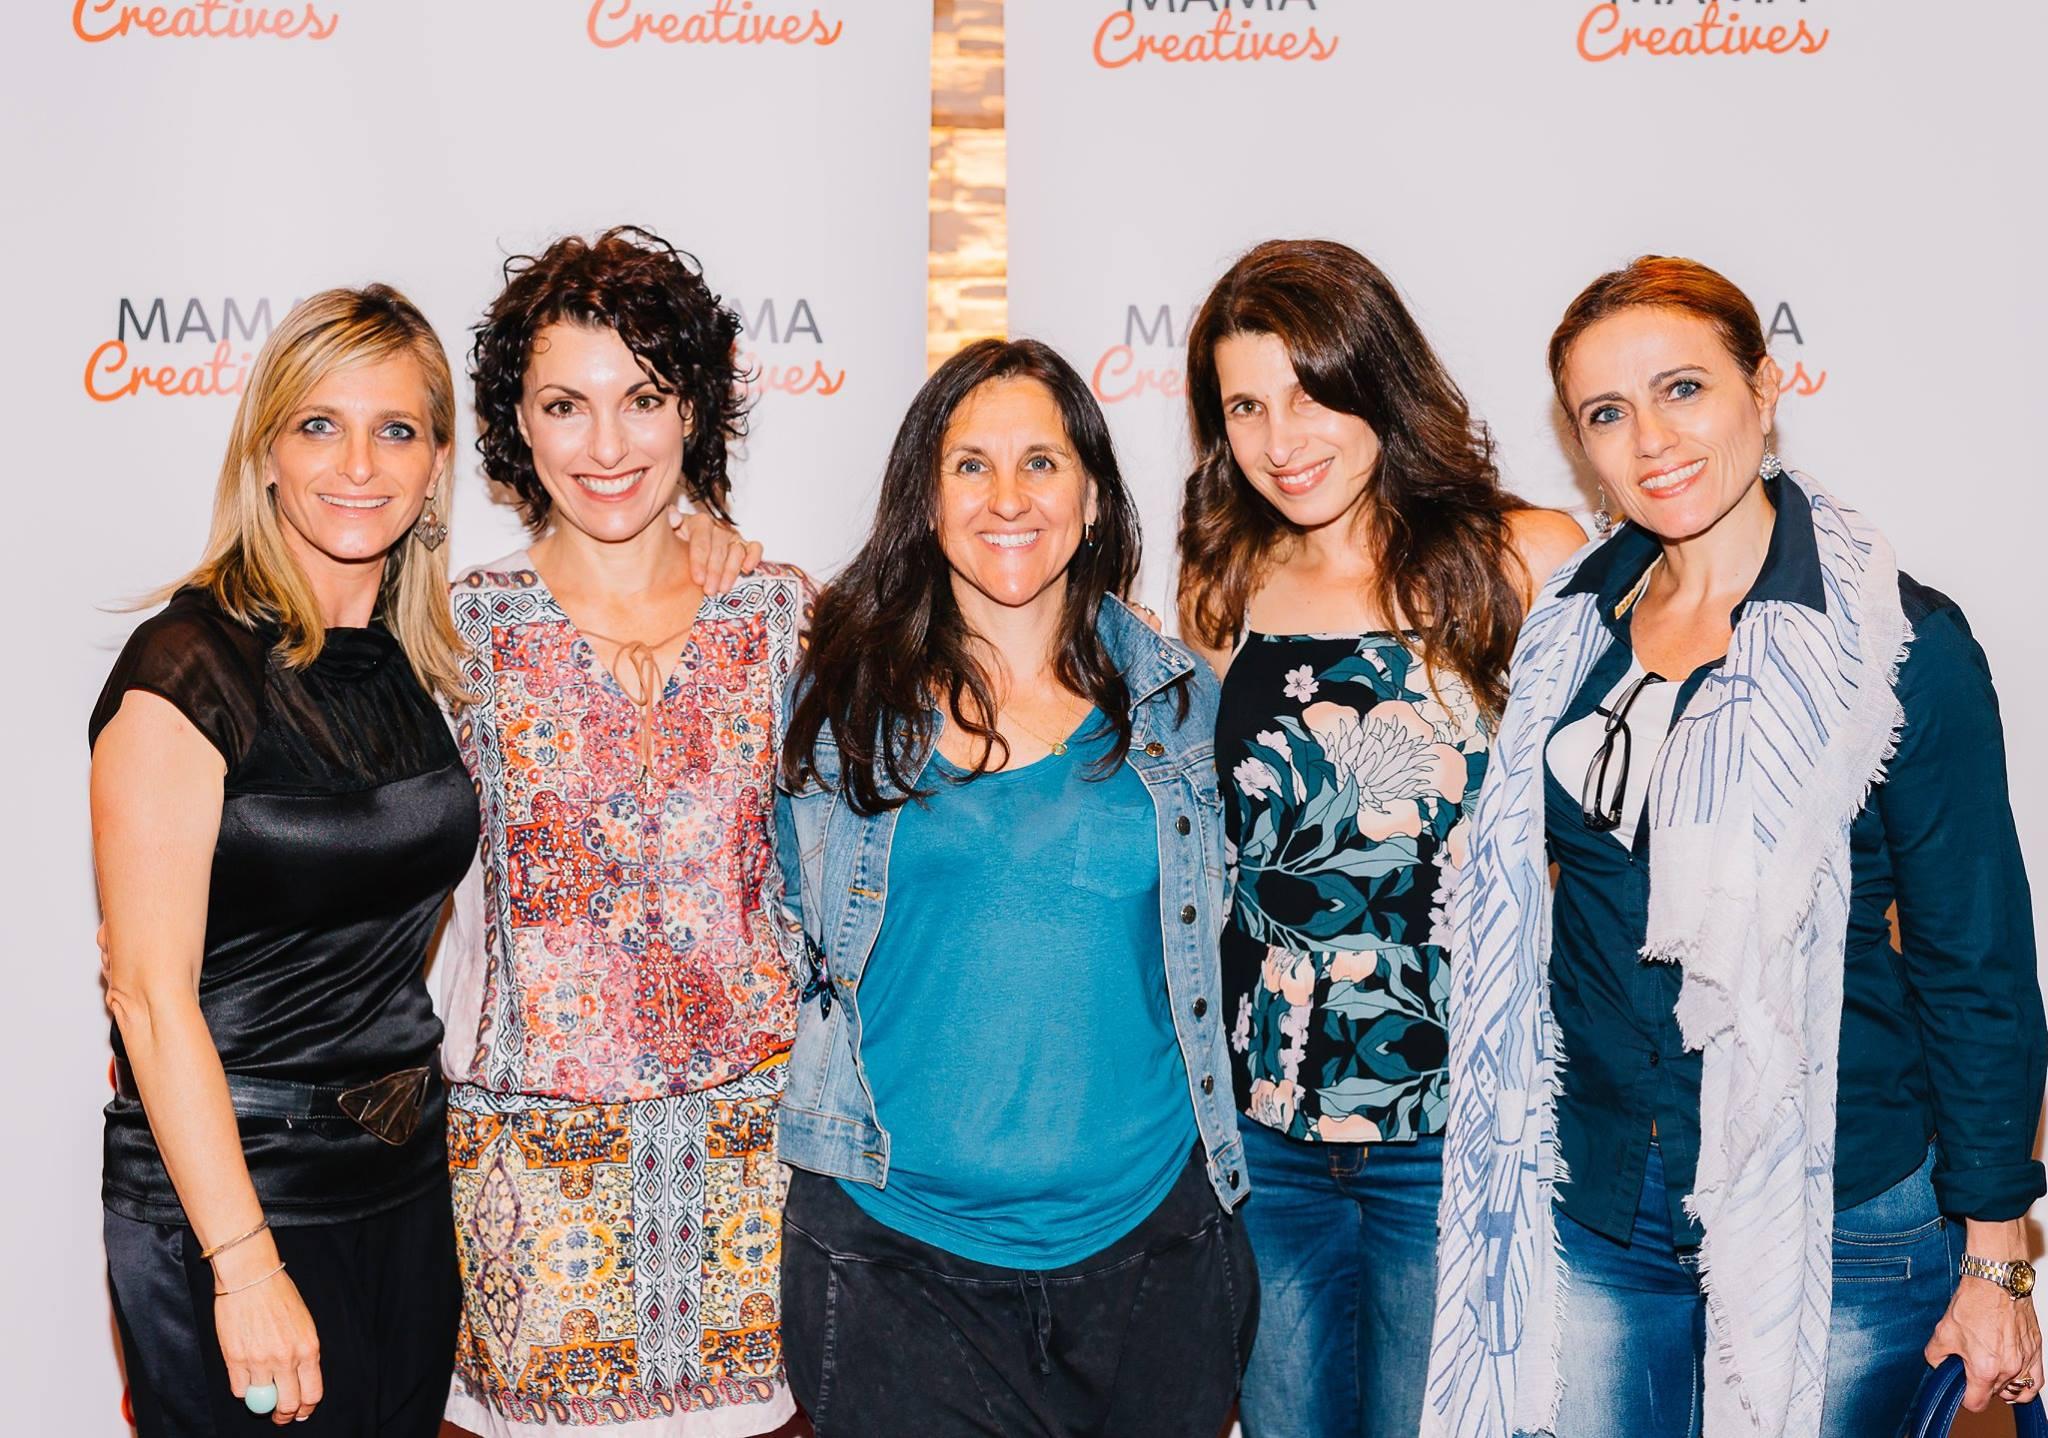 With Deb Meyer, Kerri Sackville, Tracey Fittinghoff Hayim and Ralene Reuveny.